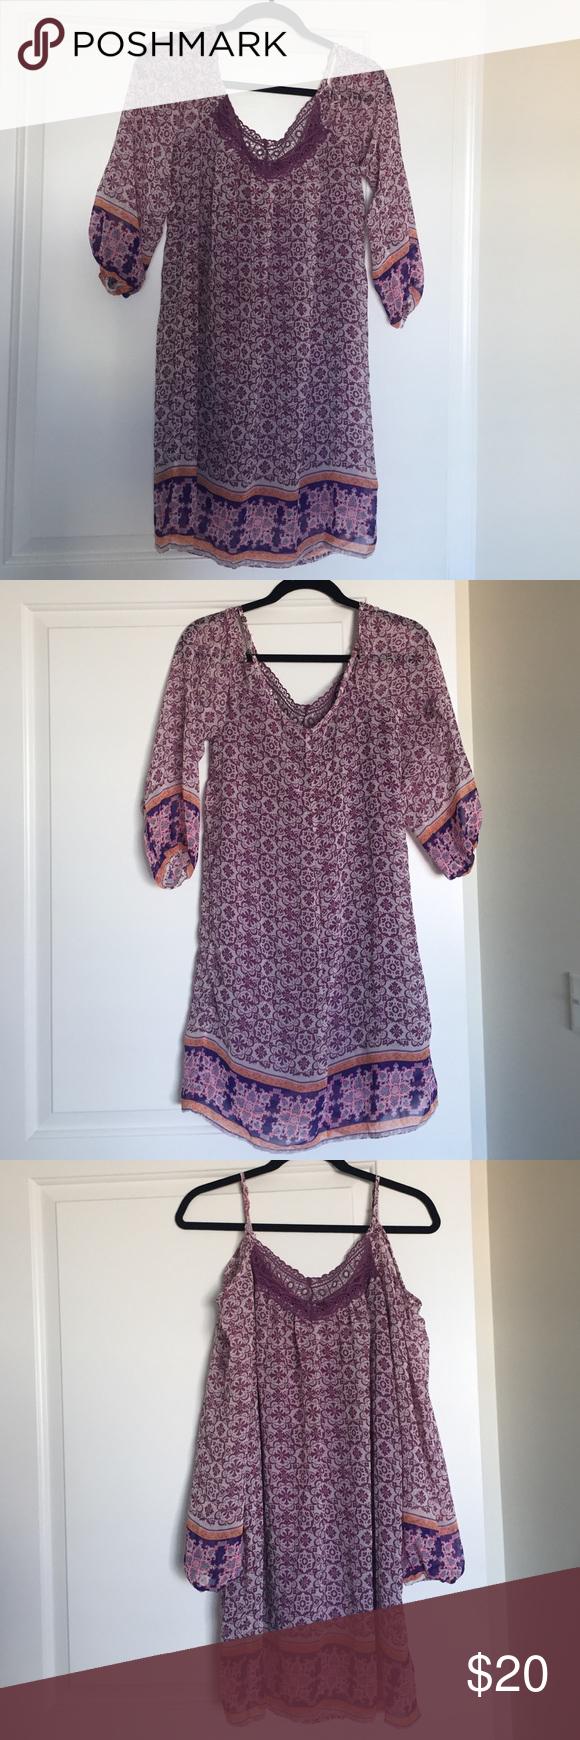 XHILARATION boho cold shoulder dress NWOT - cute vibrant bohemian dress! Perfect for vacation! Wear cold shoulder or long sleeves. Adjustable straps. Fully lined. Xhilaration Dresses